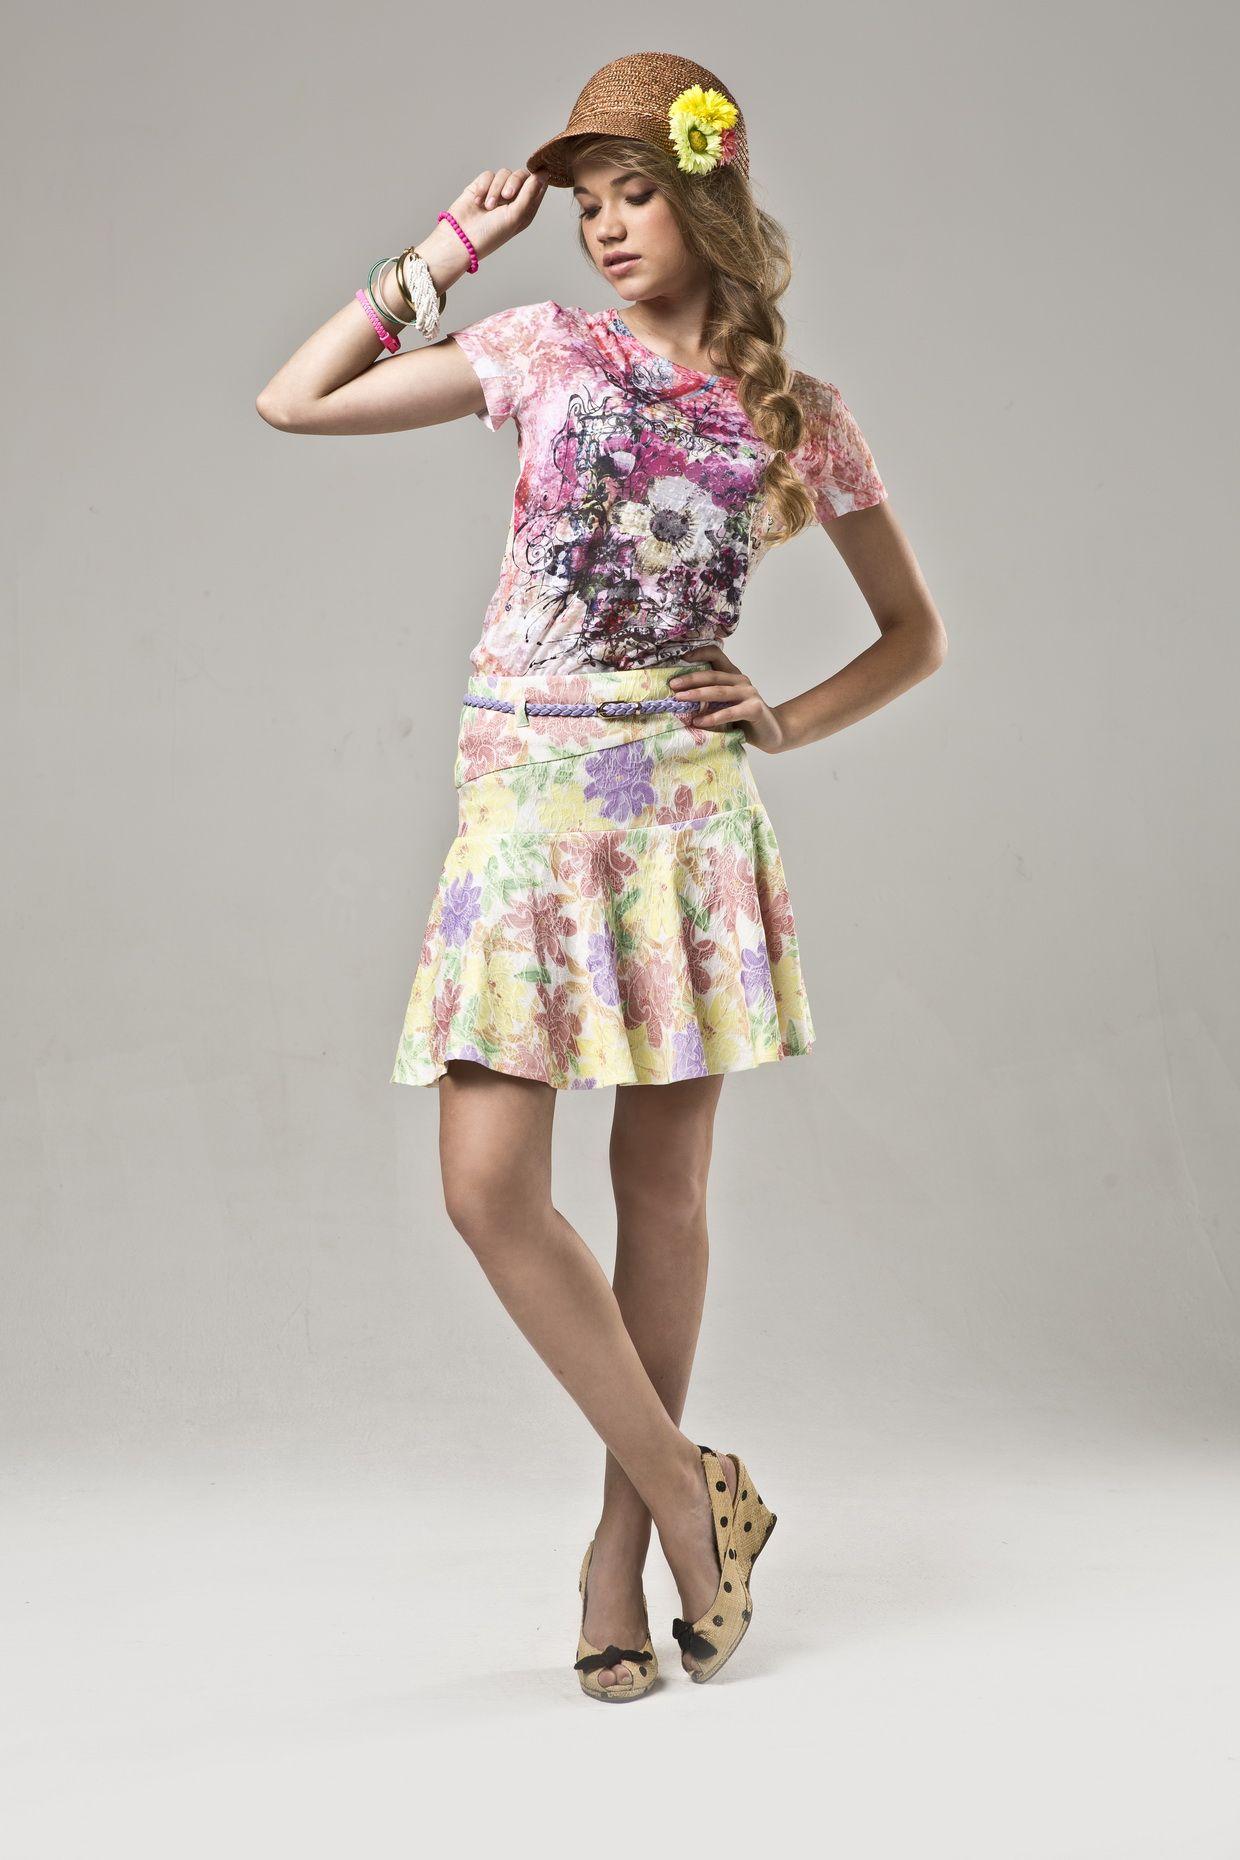 Summer comee teens fashion pinterest summer